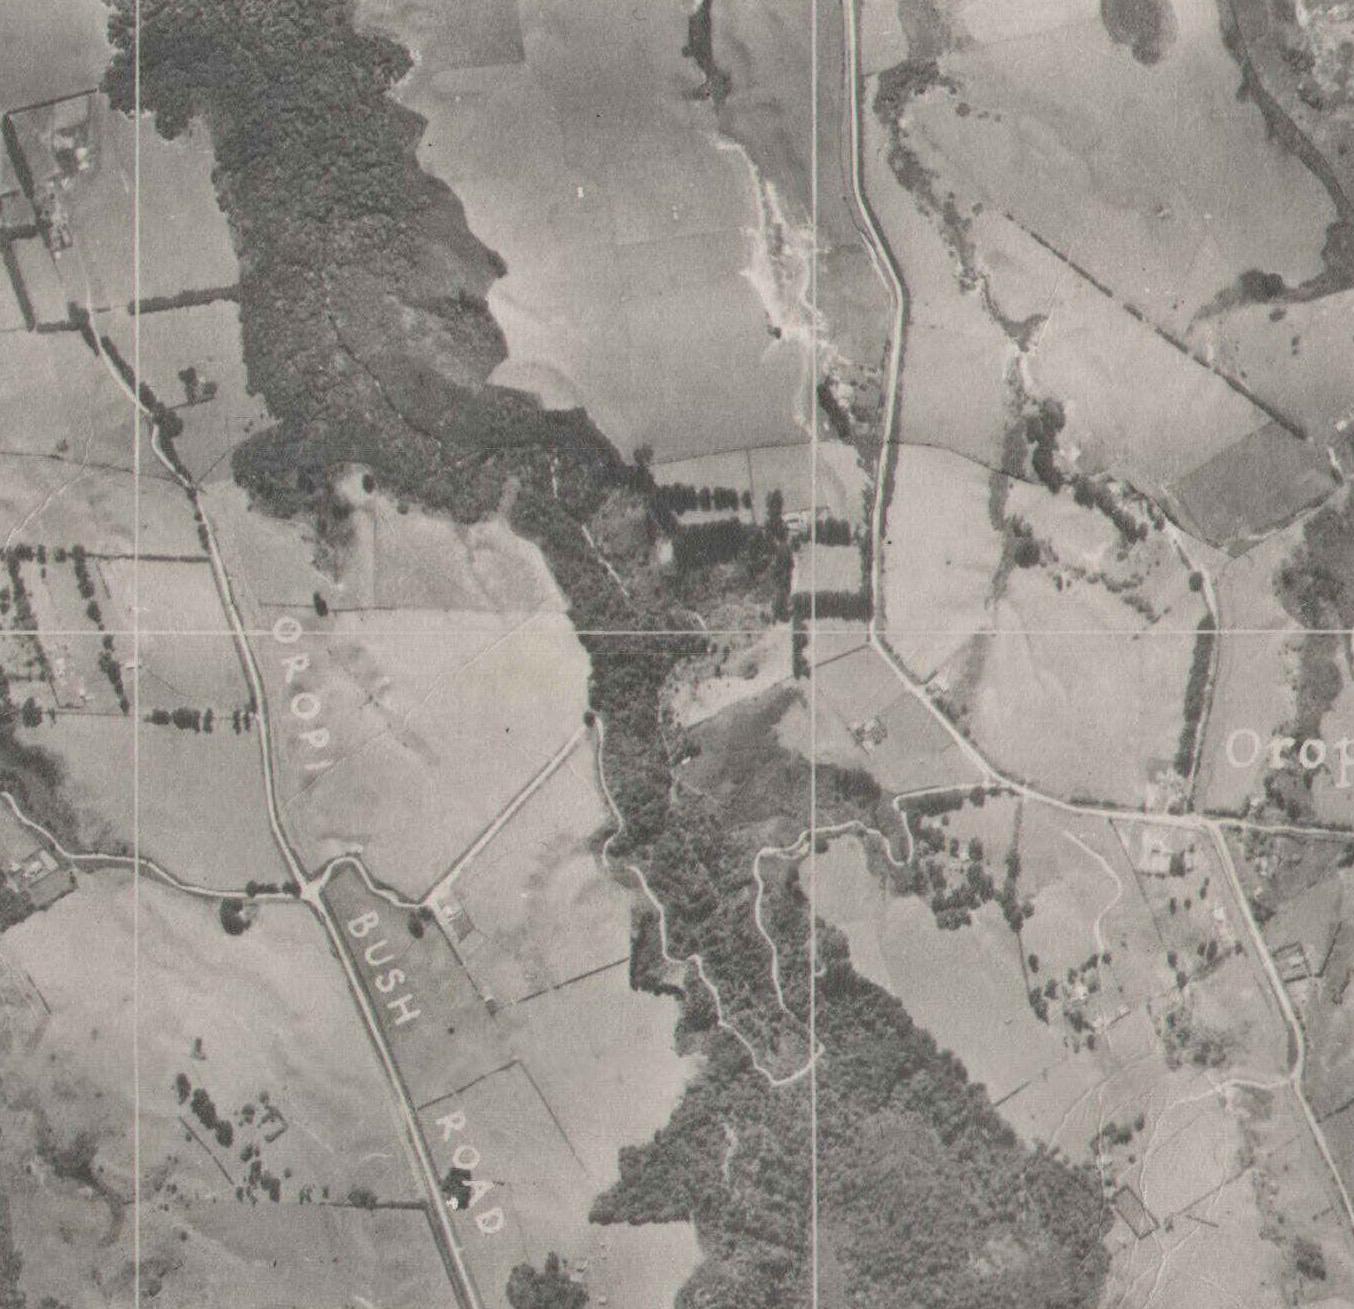 1943 aerial map - Oropi Bush Rd became Gluepot Rd